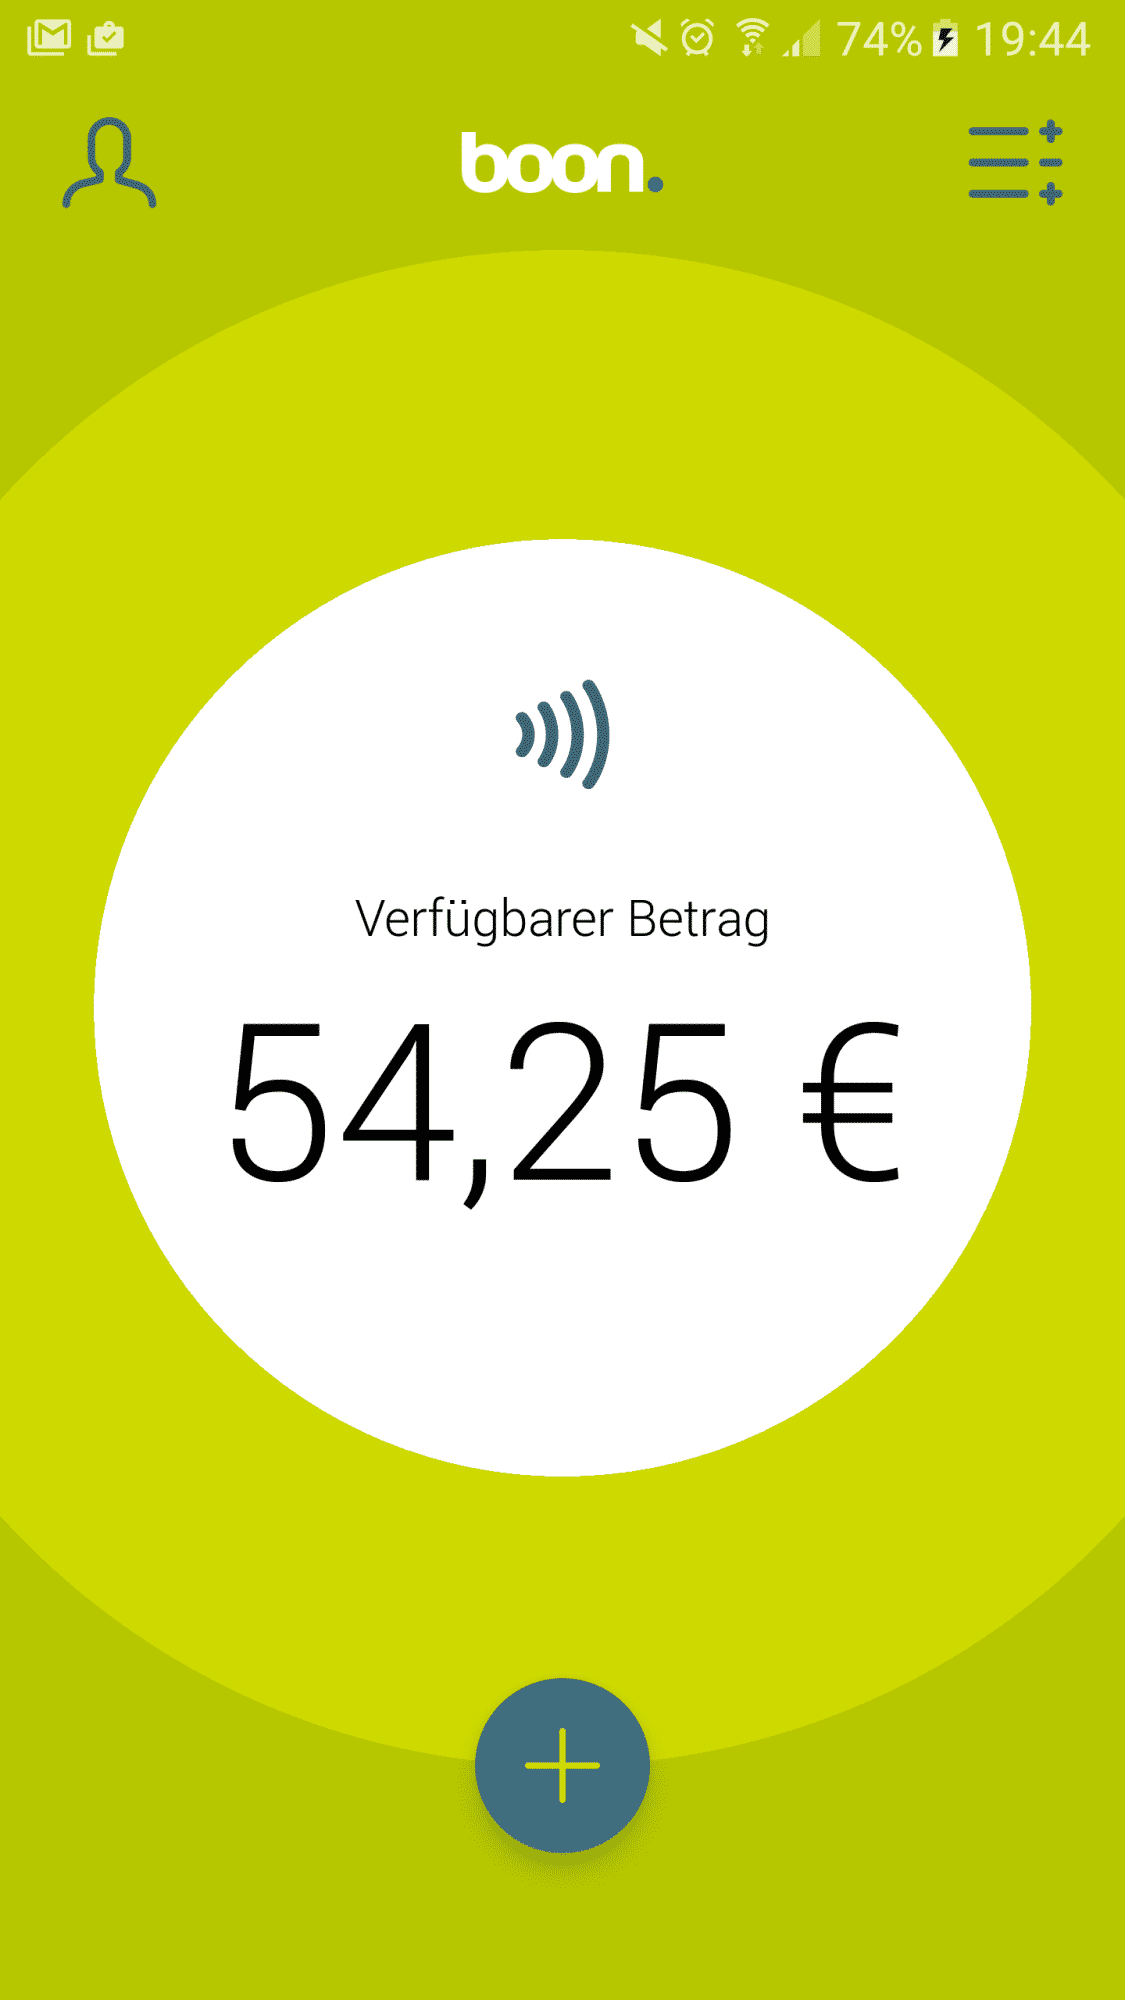 Mit der Android-App Boon kann man in den meisten Supermärkten bezahlen.